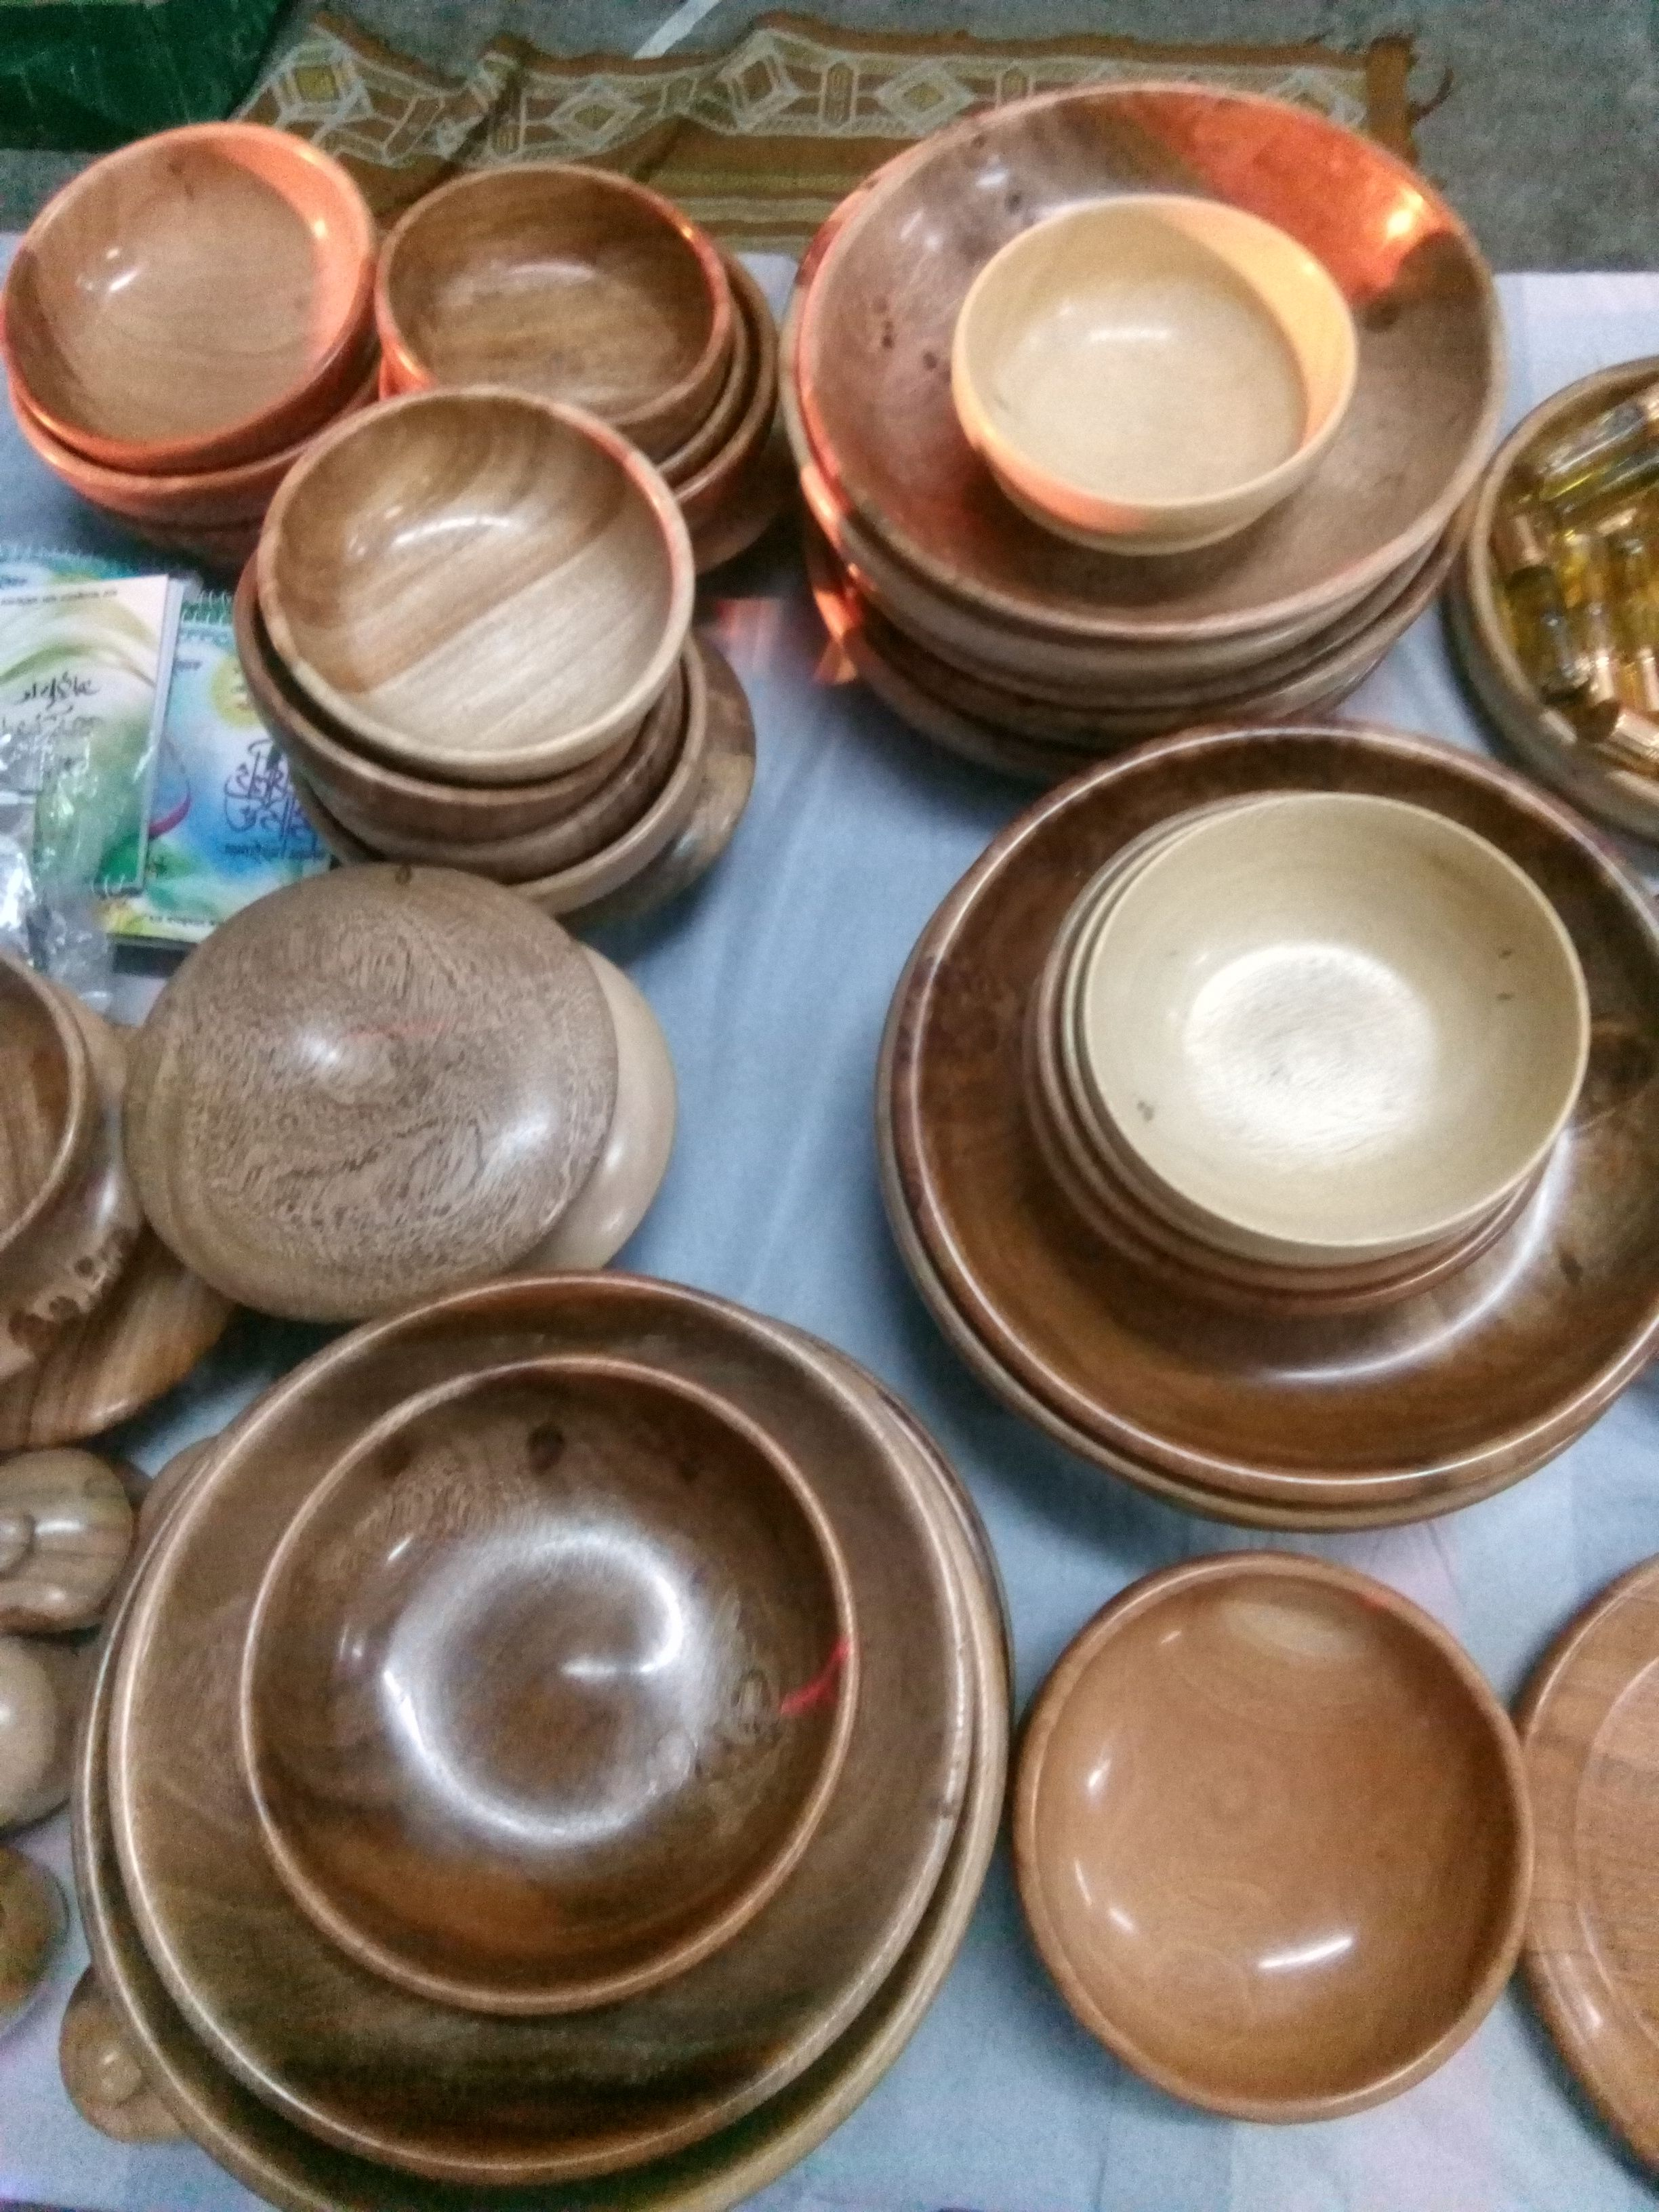 Sunnati Wooden Plate Cup Bowl Available Canteen Shareef Rajarbag Darbar Shareef Dhaka Bangladesh Contact 880 1711 272 Wooden Plates Plates Tableware